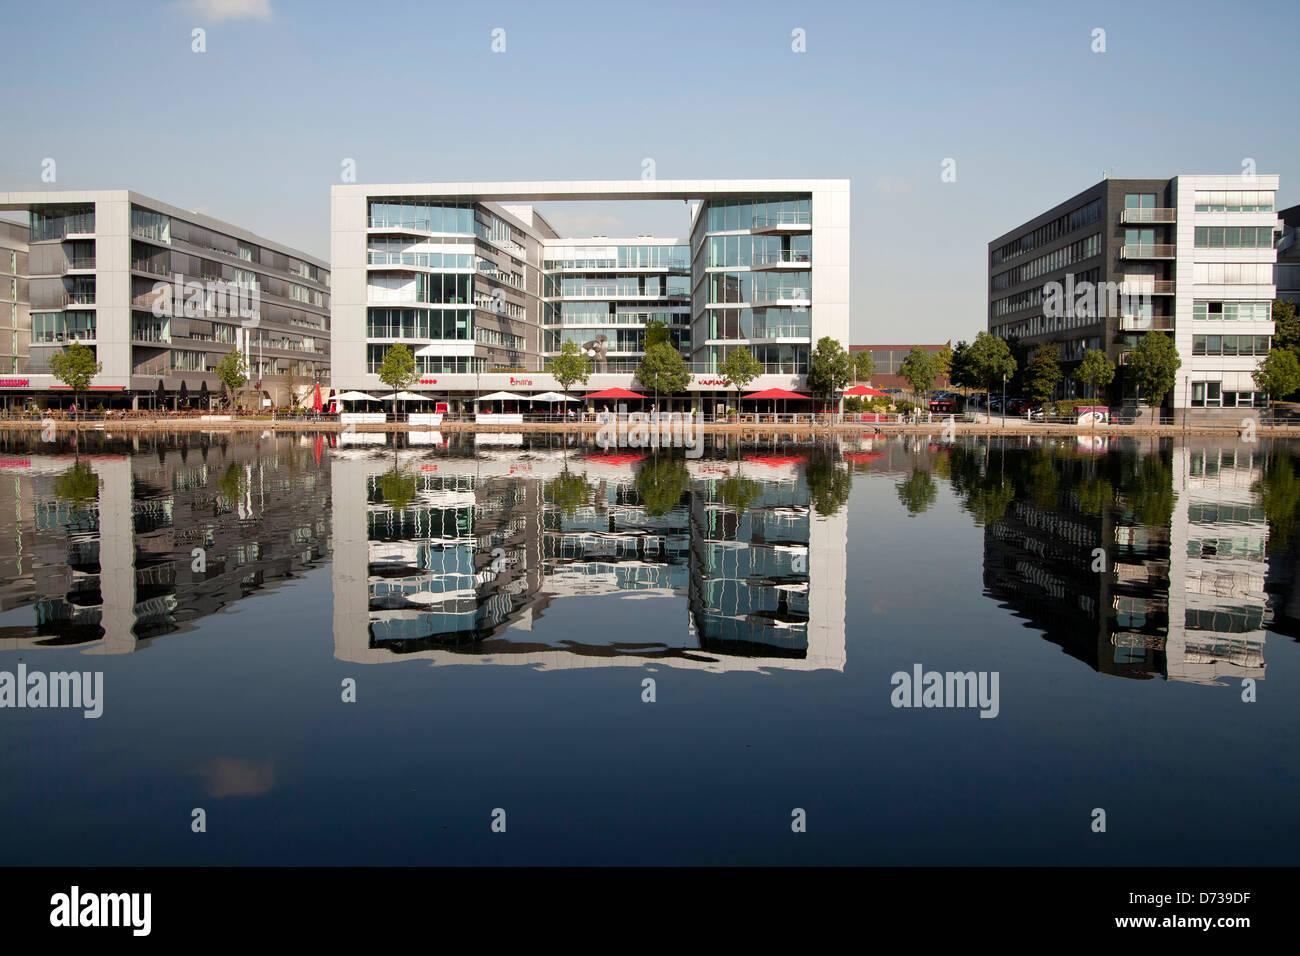 modern architecture at Duisburg Inner Harbour, Duisburg, North Rhine-Westphalia, Germany, Europe Stock Photo